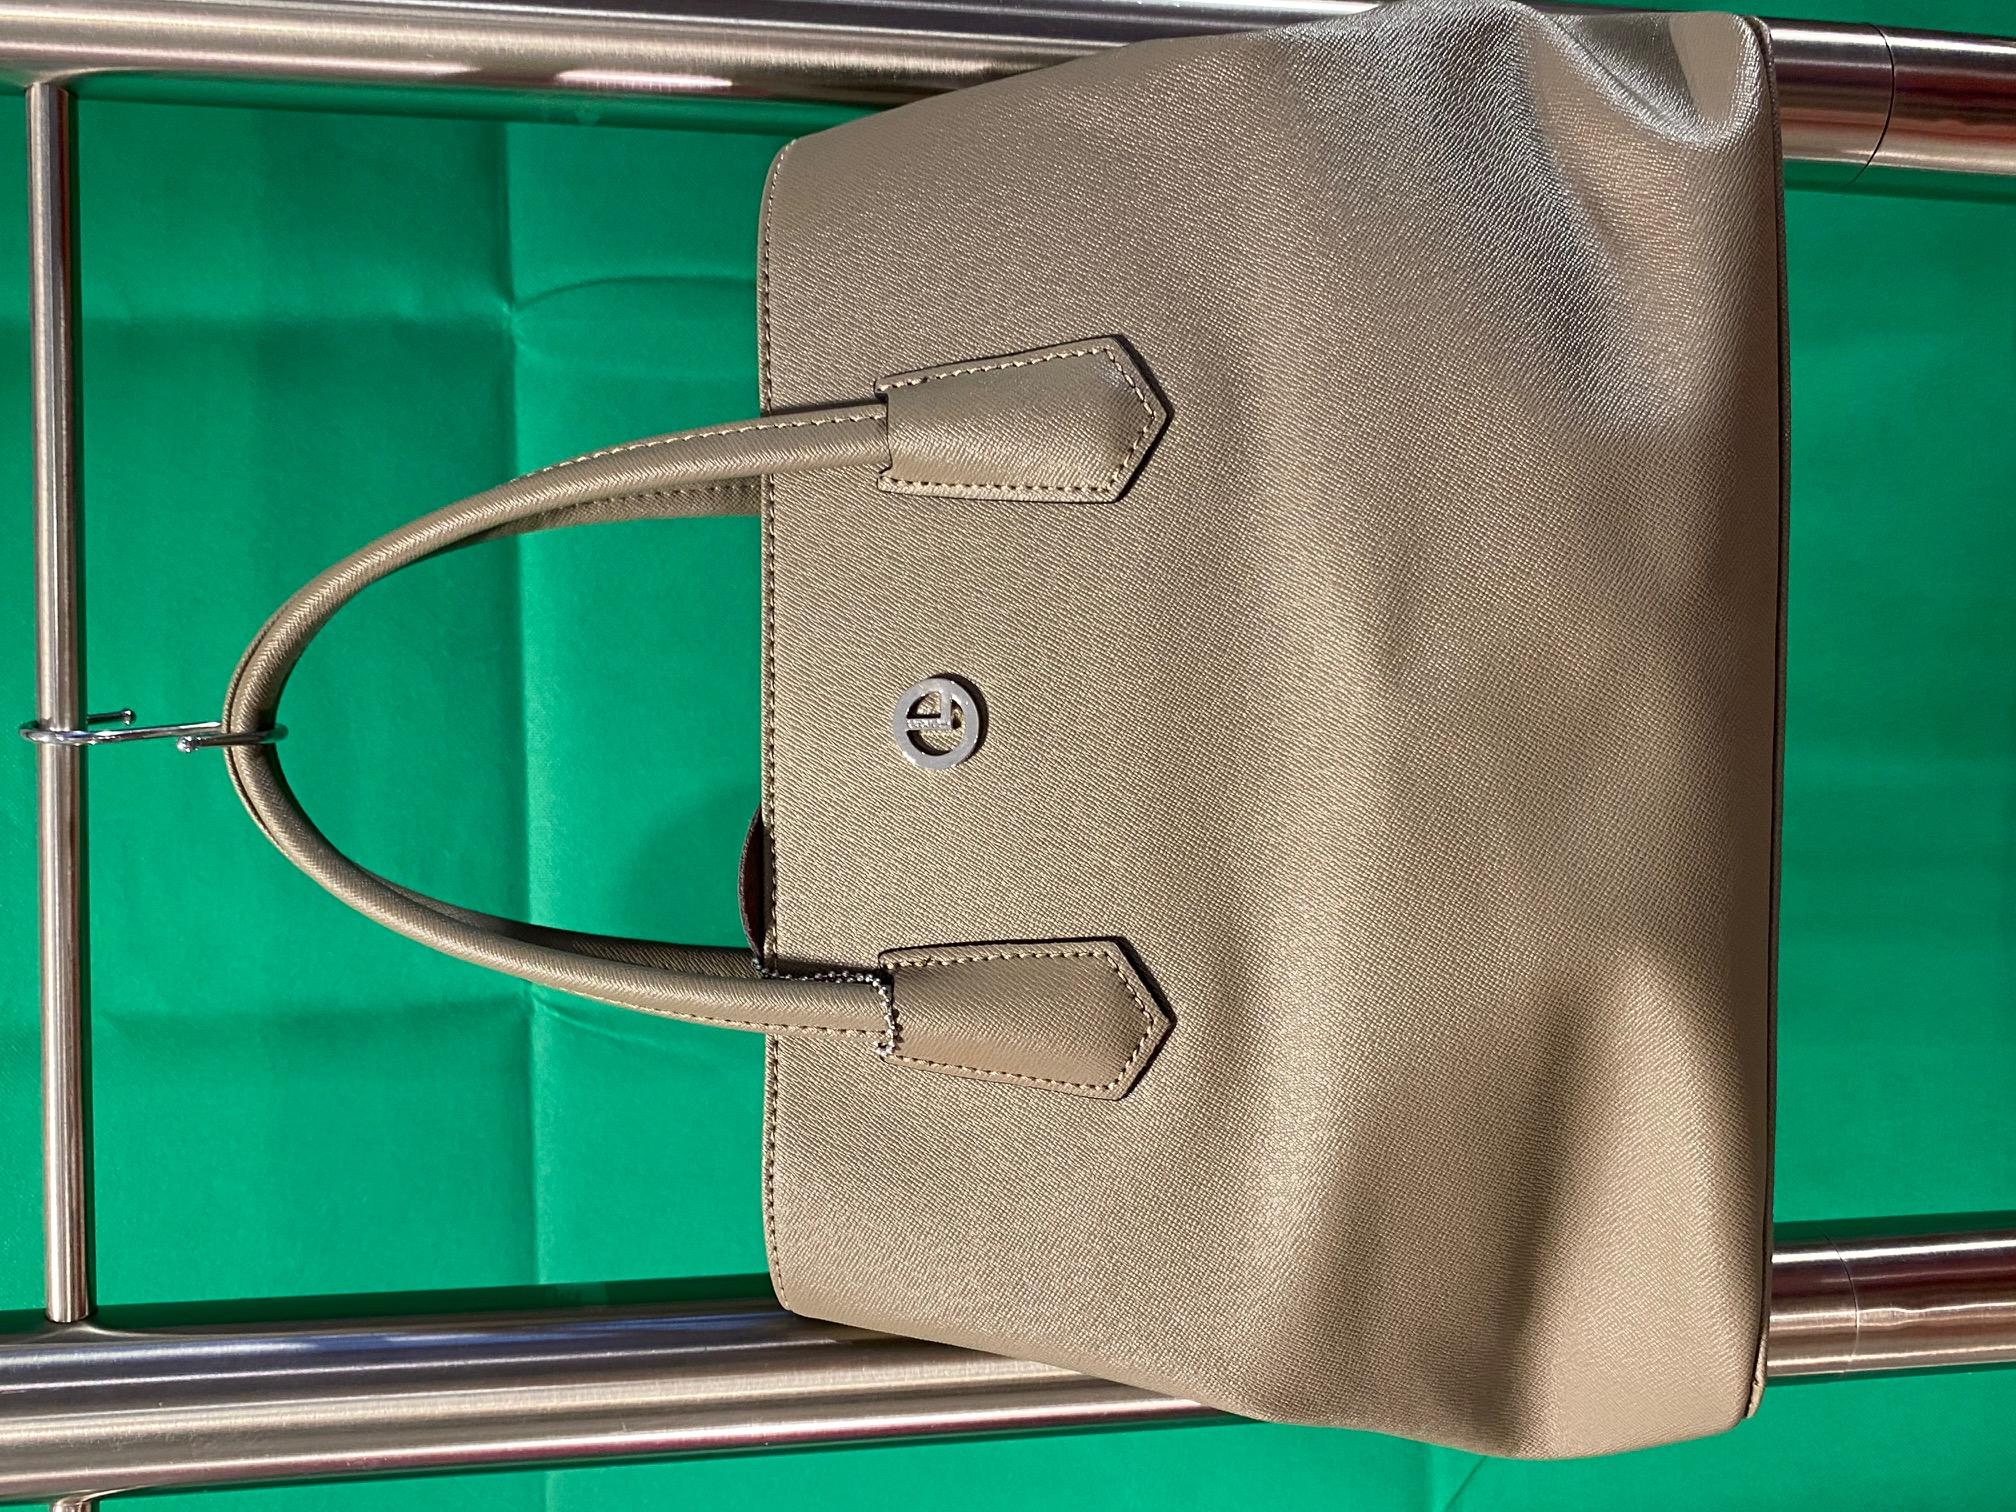 Tasche Leder grau grün L Credi